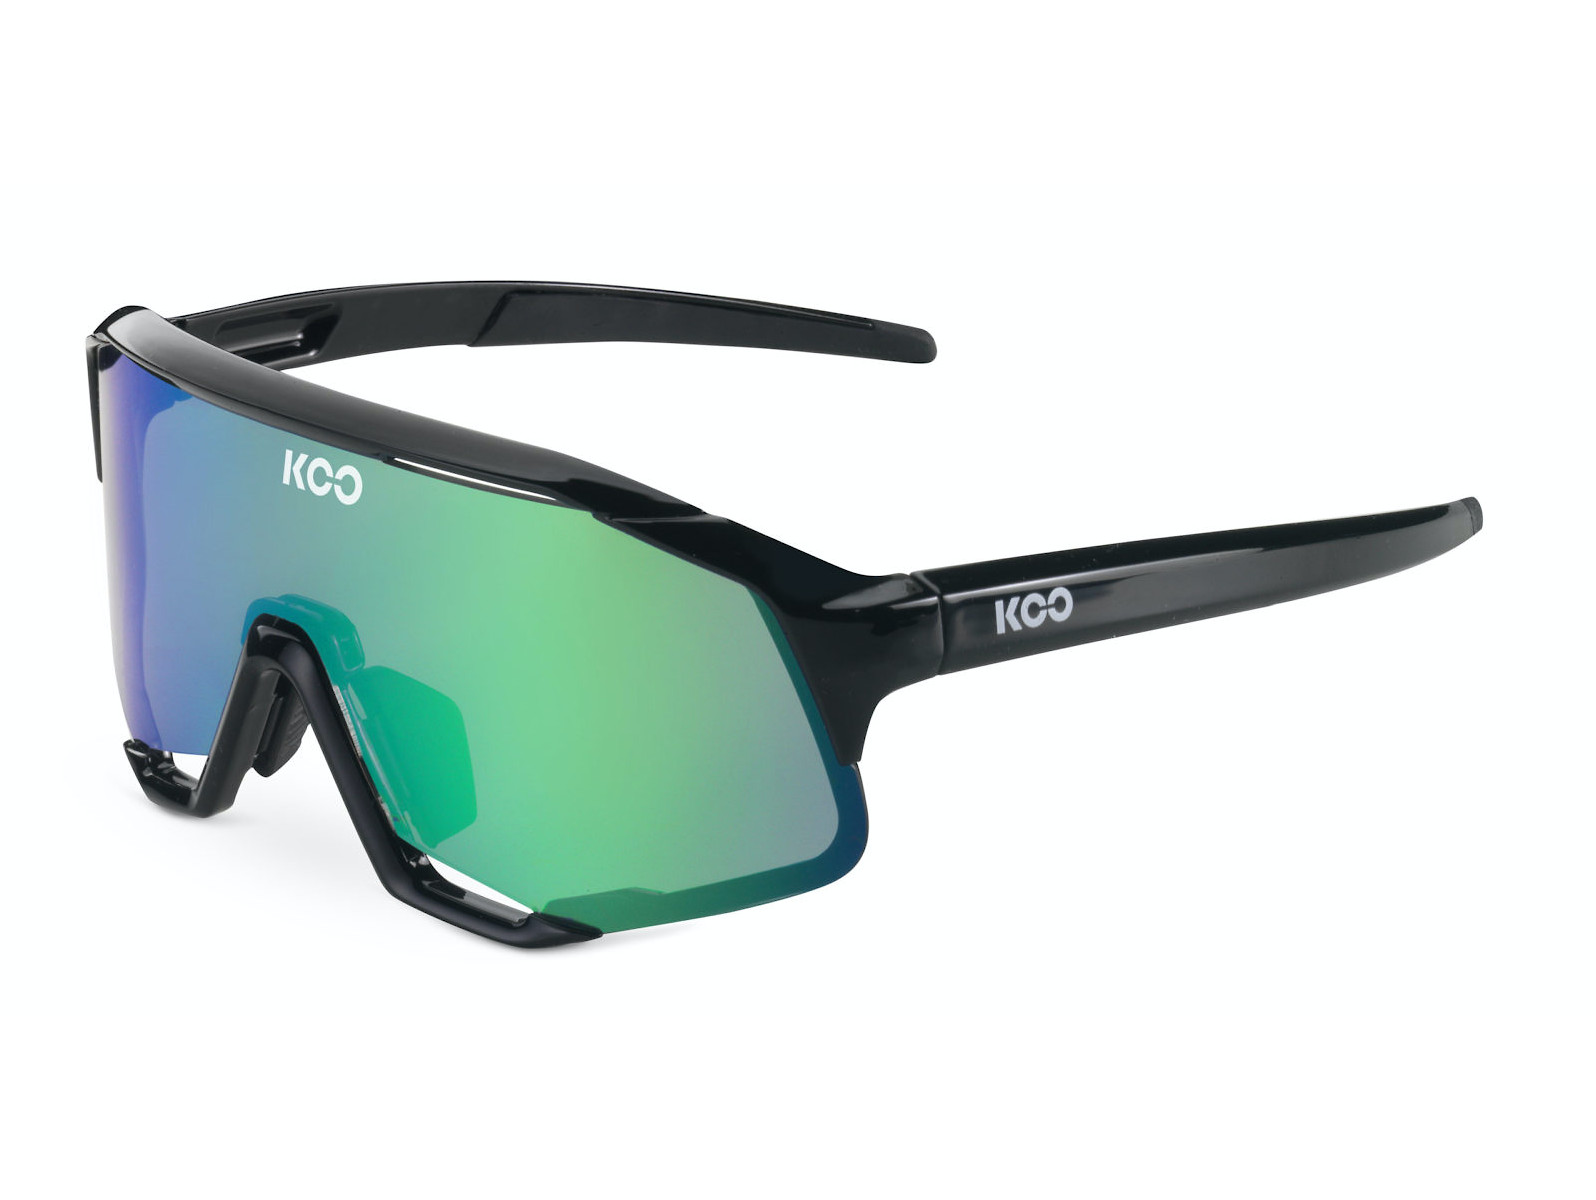 KOO Demos – Black/Green